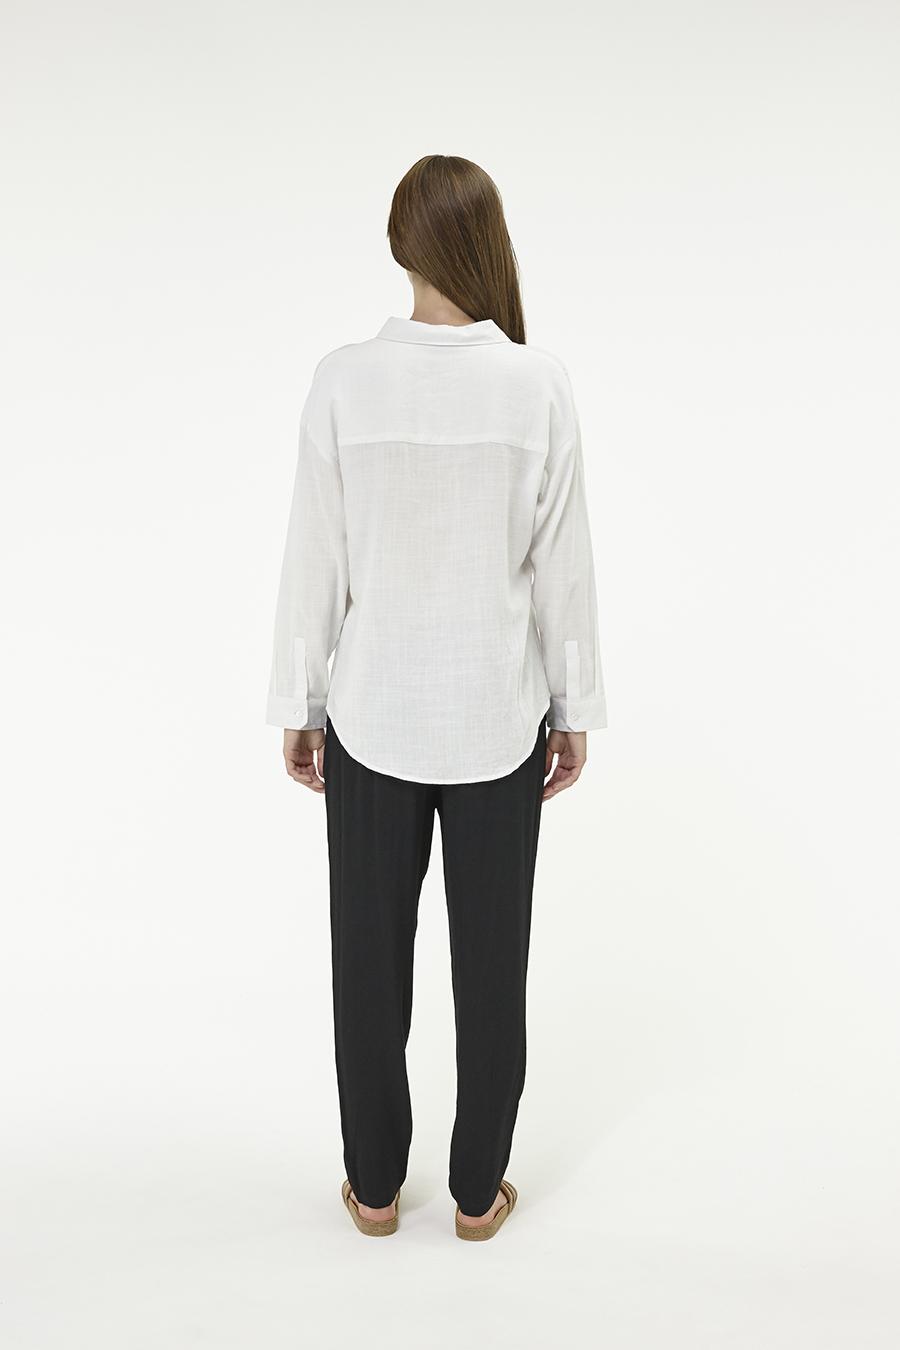 Huffer_Q3-16_W-Rome-Shirt_White-03